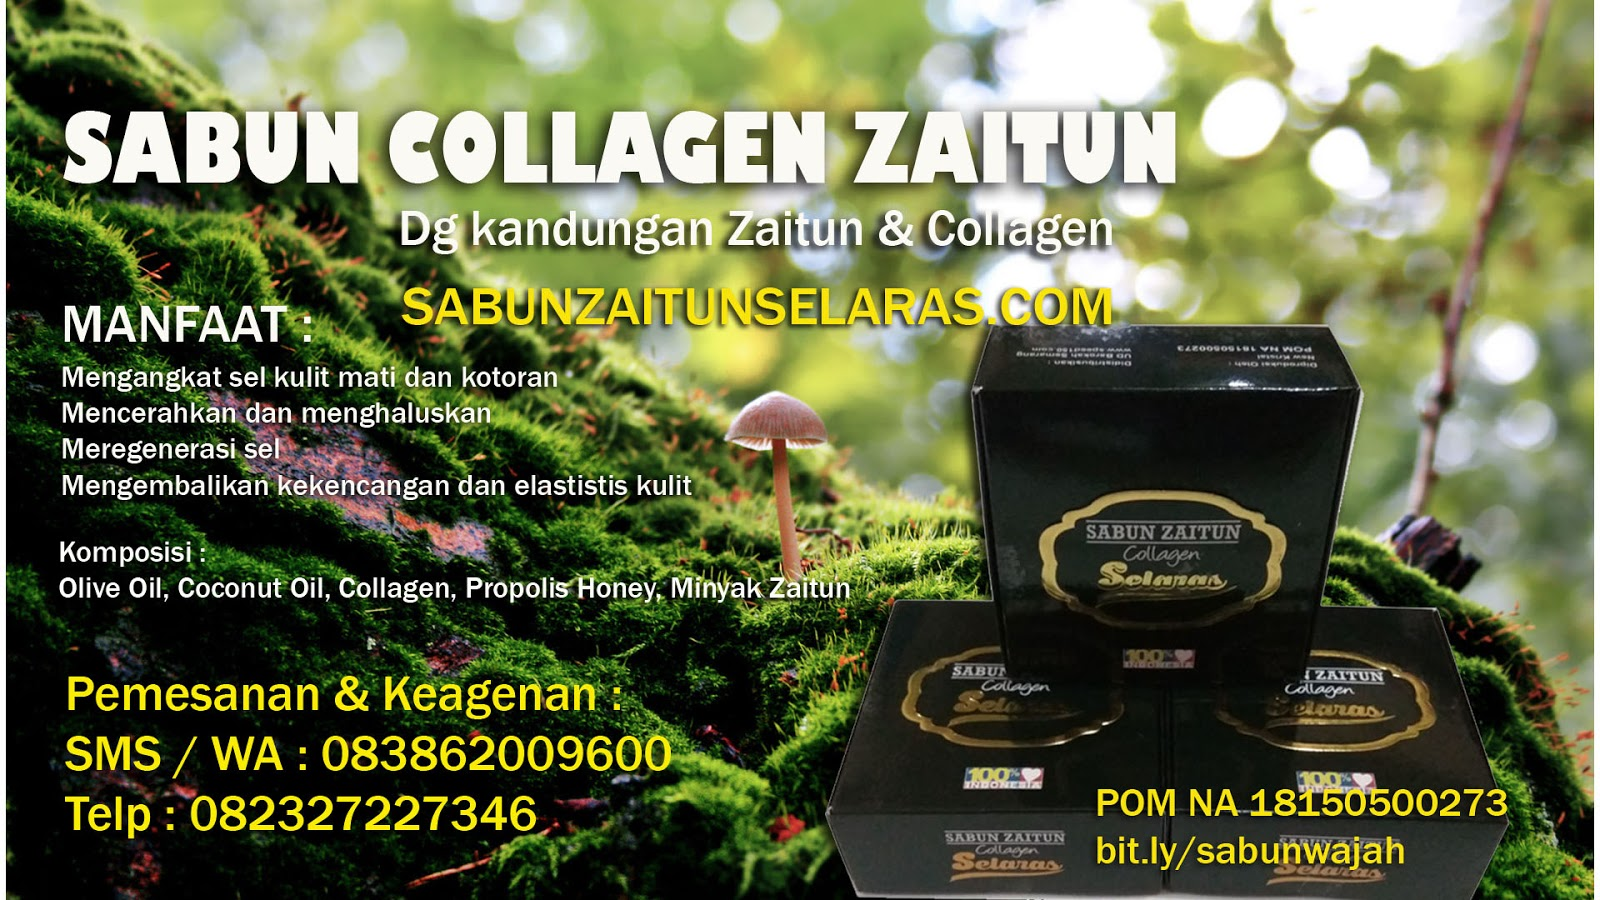 Sabun Herbal Zaitun With Collagen Surabaya 083862009600 Colagen Agen Speed 150 Menjual Untuk Kota Dan Sekitarnya Kami